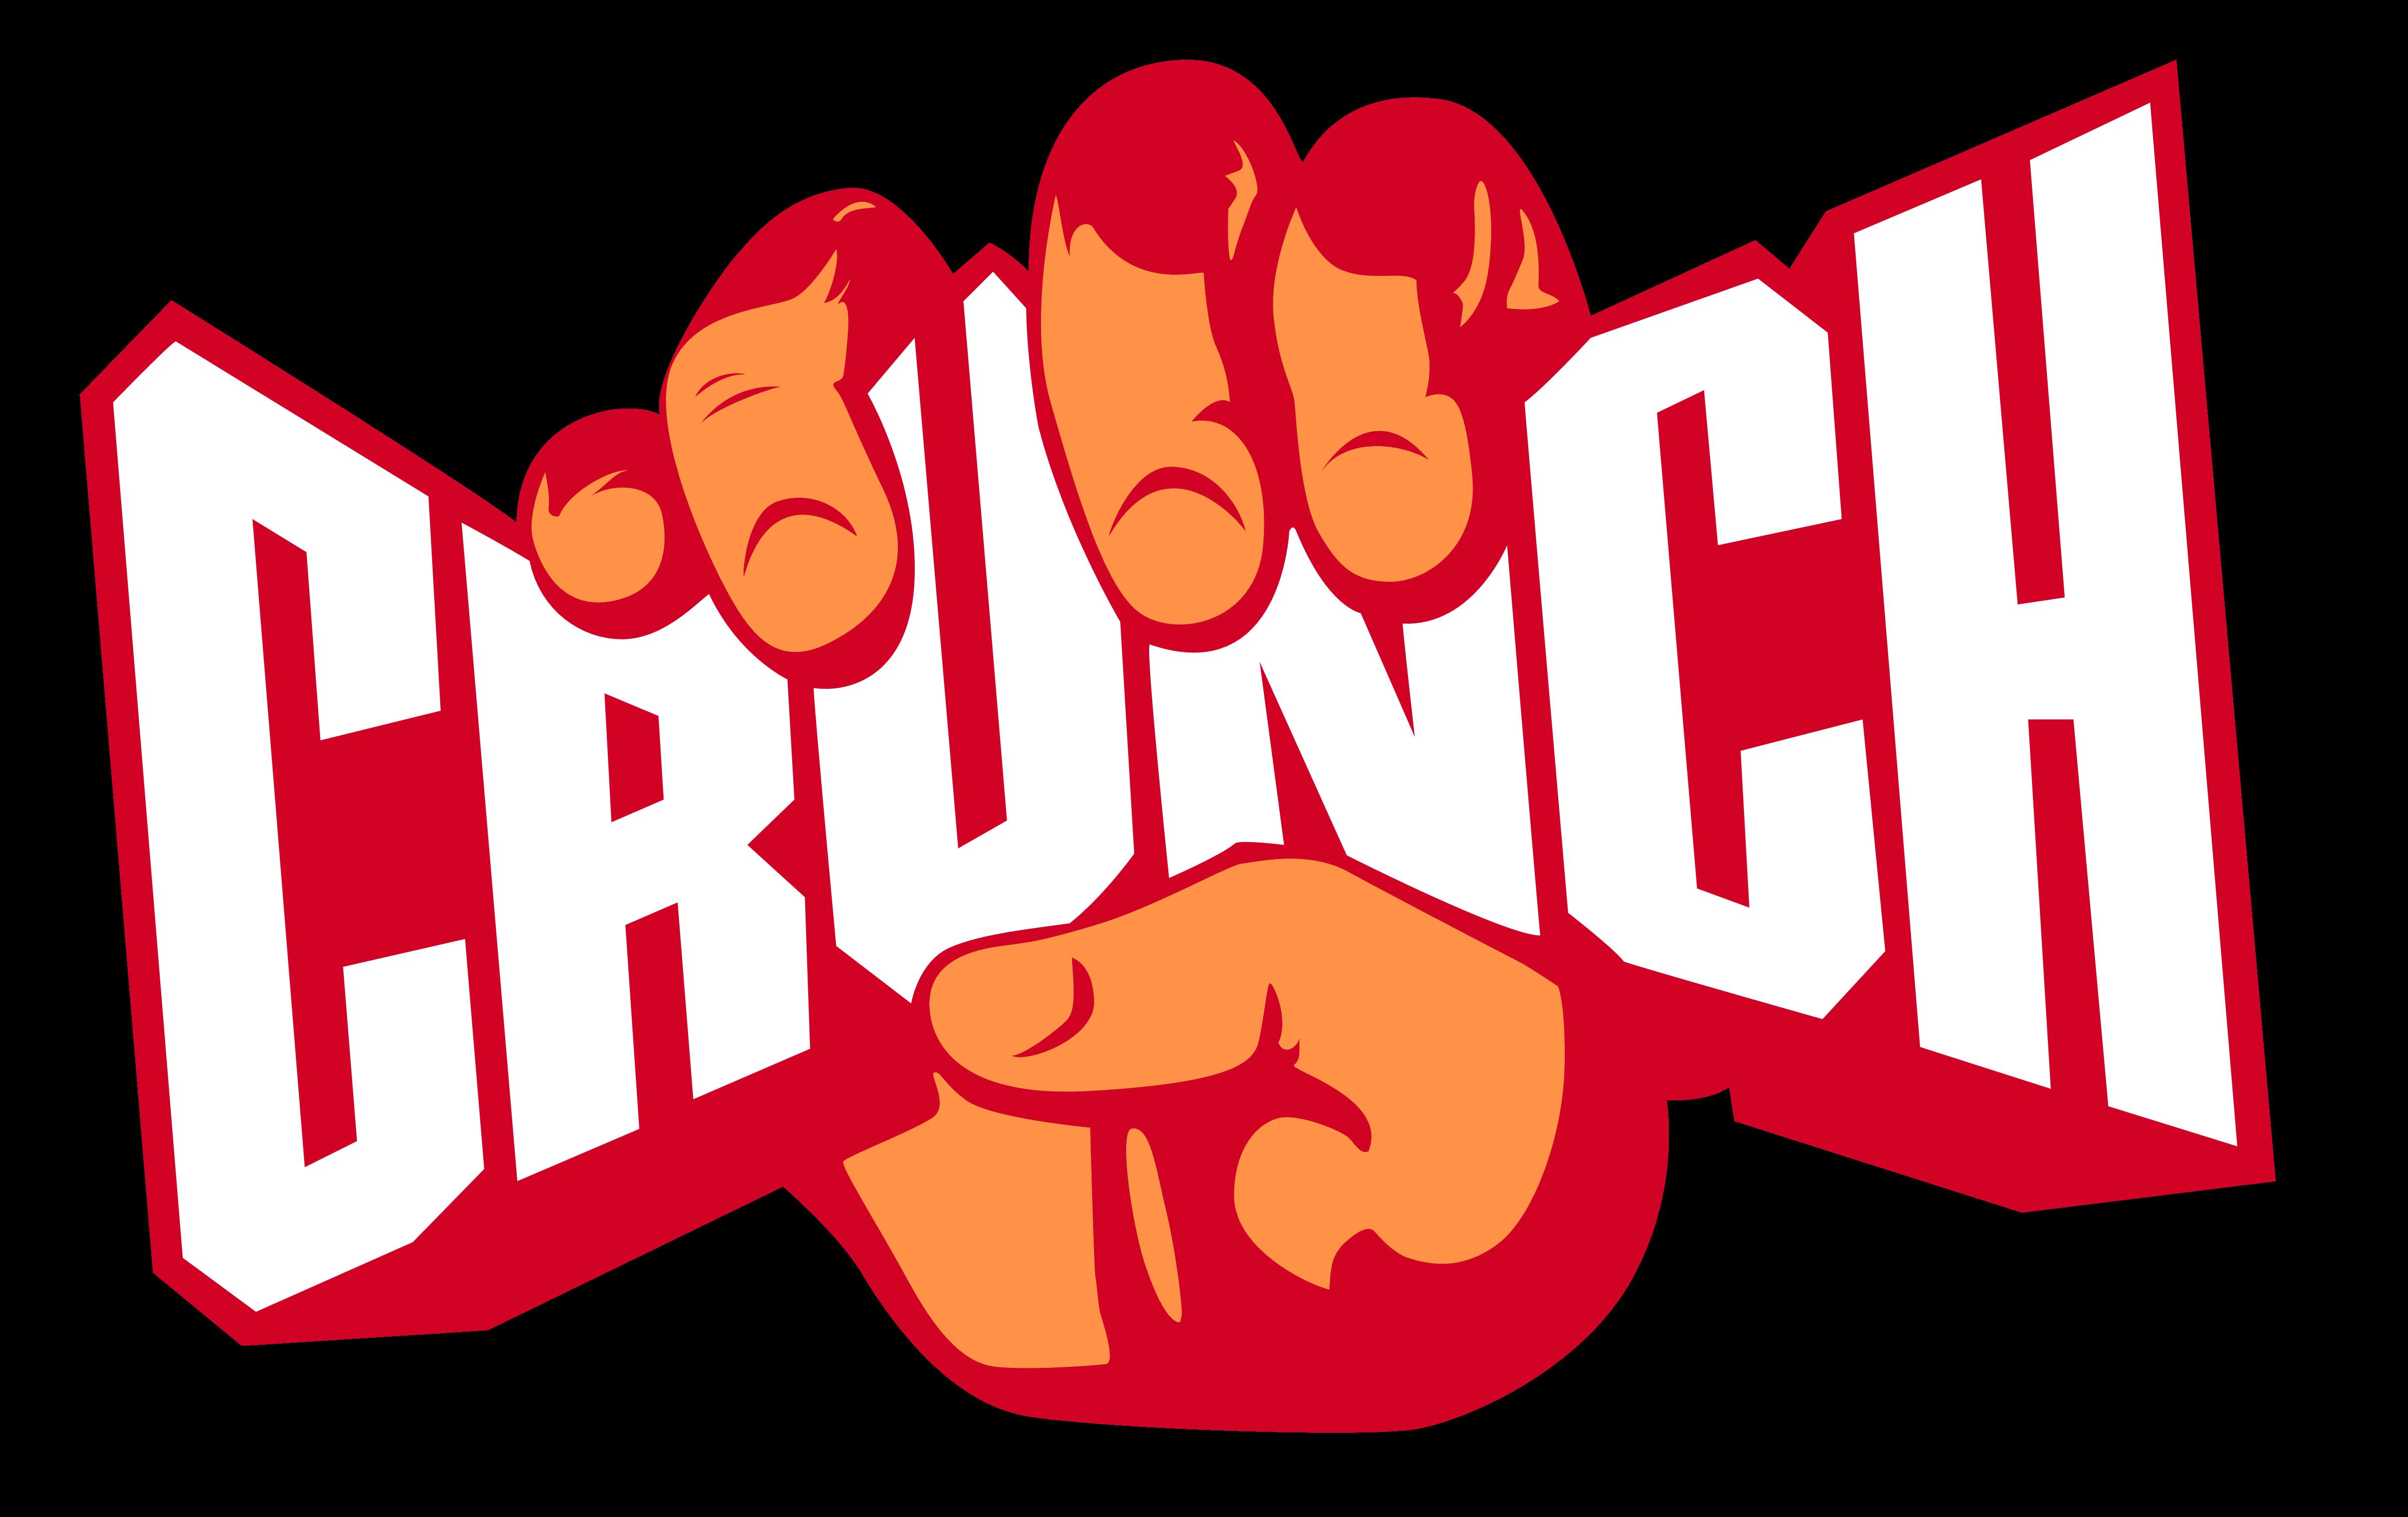 Crunch_Gym_Fitness_logo